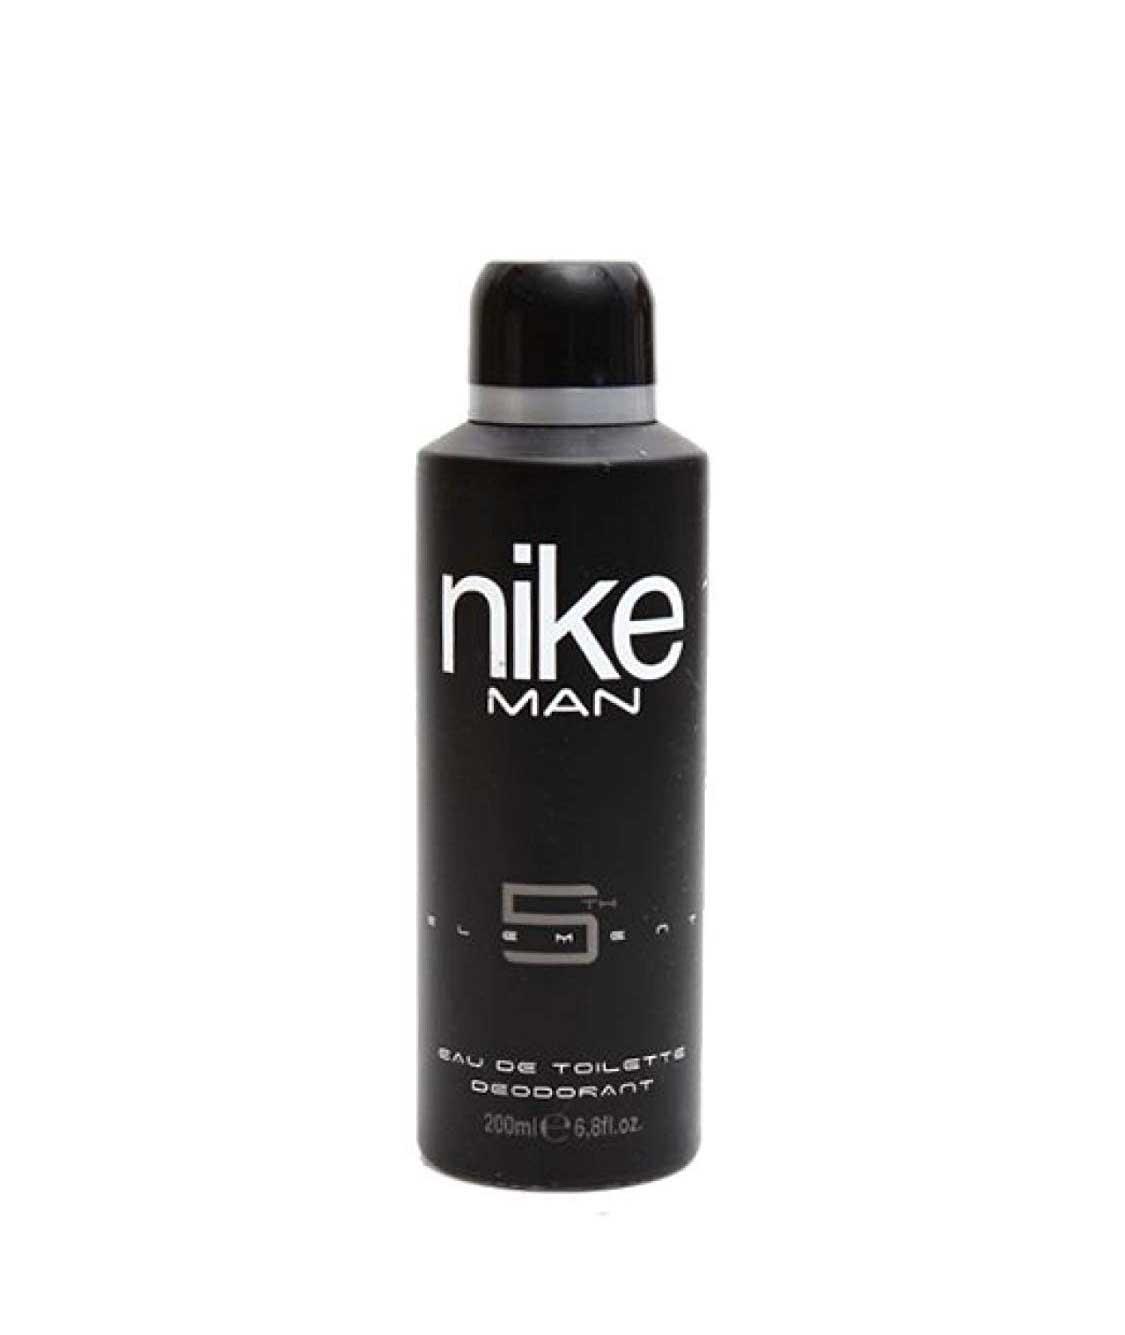 Nike N5Th Element EDT Deo Spray for Men, Black, 200ml